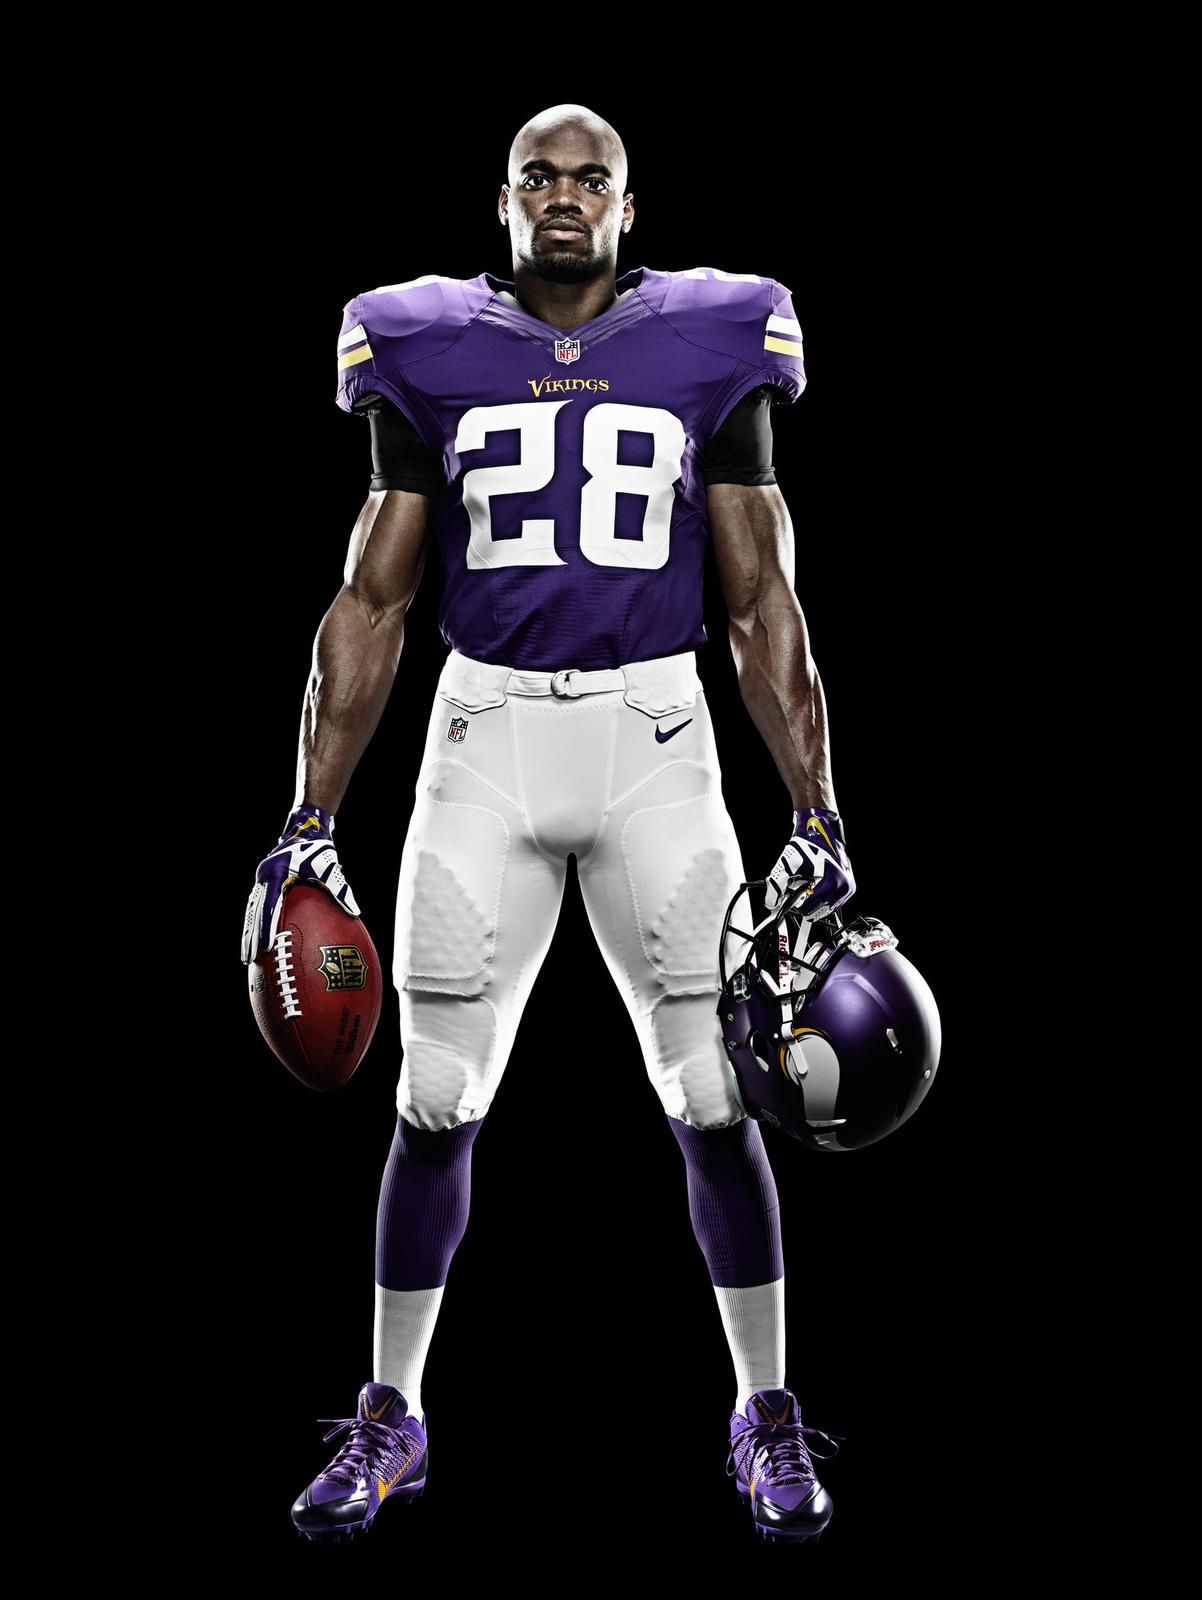 Minnesota Vikings and Nike Unveil New Uniform Design for 2013 ...